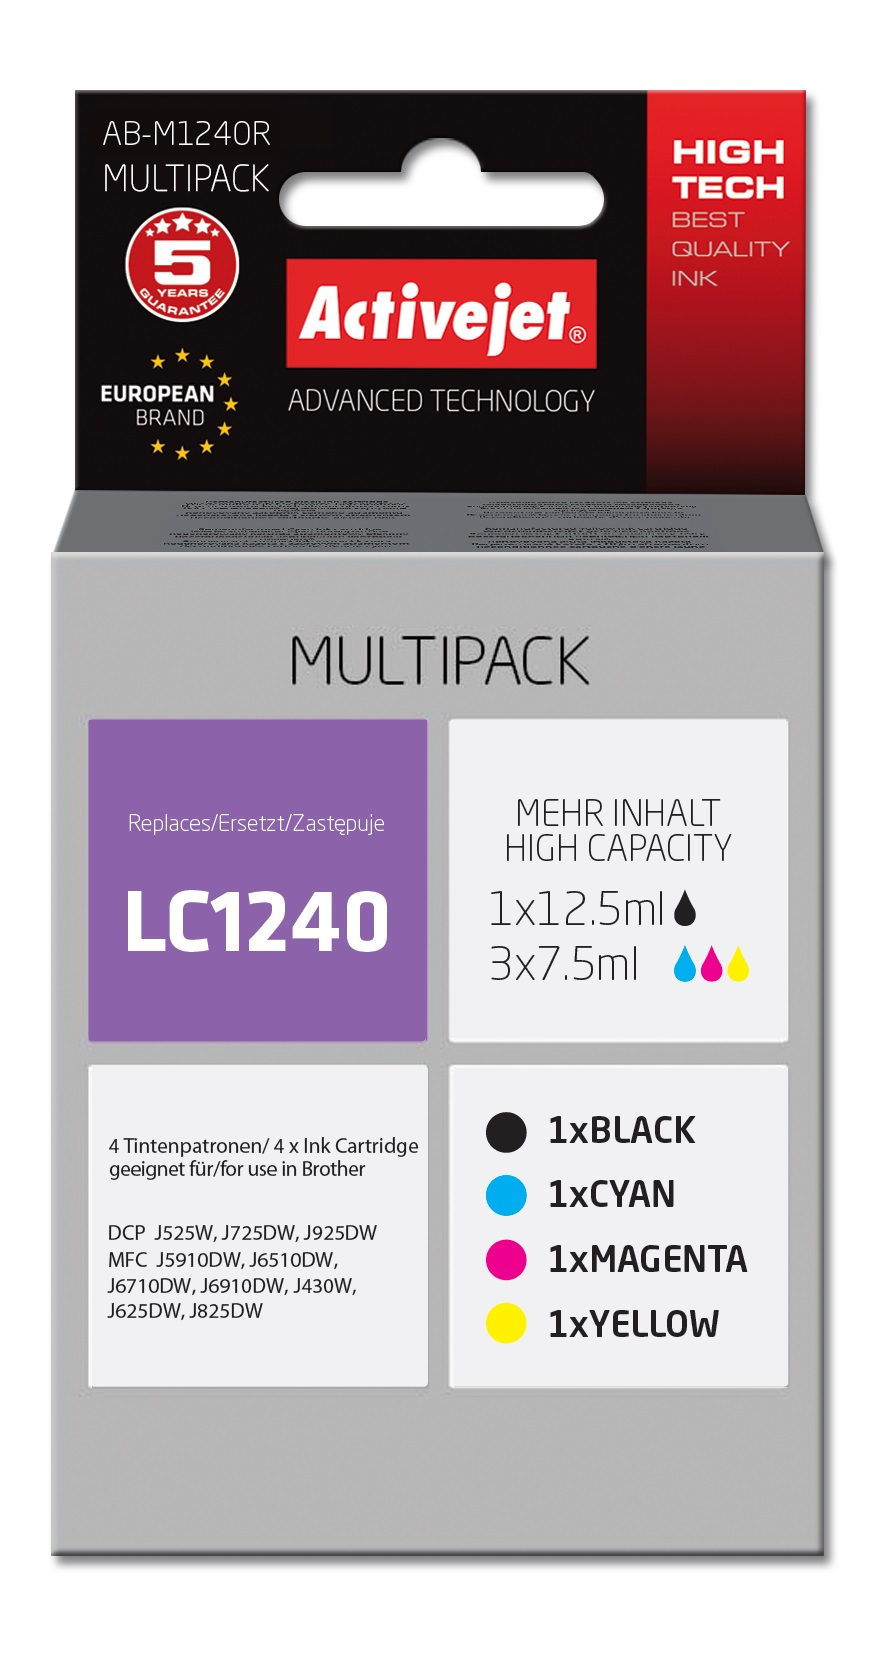 Tusz multipack Activejet AB-M1240R (do drukarki Brother, zamiennik LC1240 premium 1x12,5, 3x7,5ml cyan,czarny,yellow,magenta)